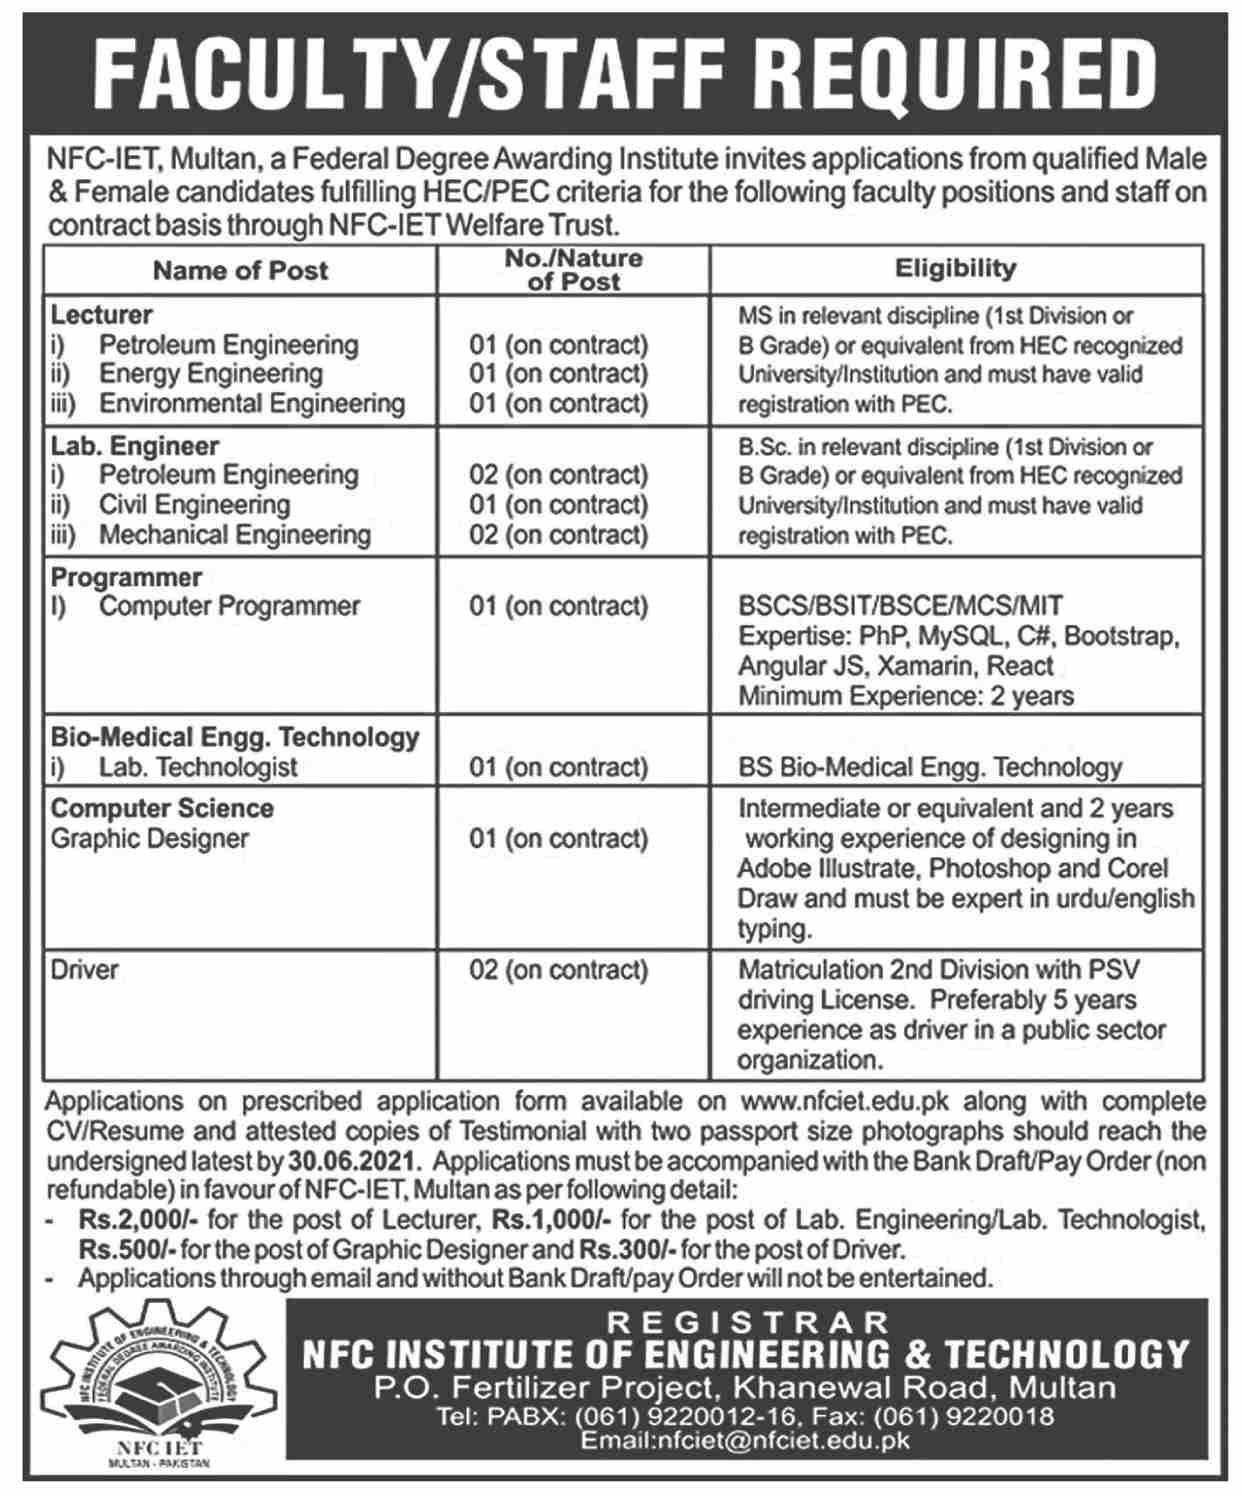 www.nfciet.edu.pk Jobs 2021 - NFC Institute of Engineering & Technology Jobs 2021 in Pakistan